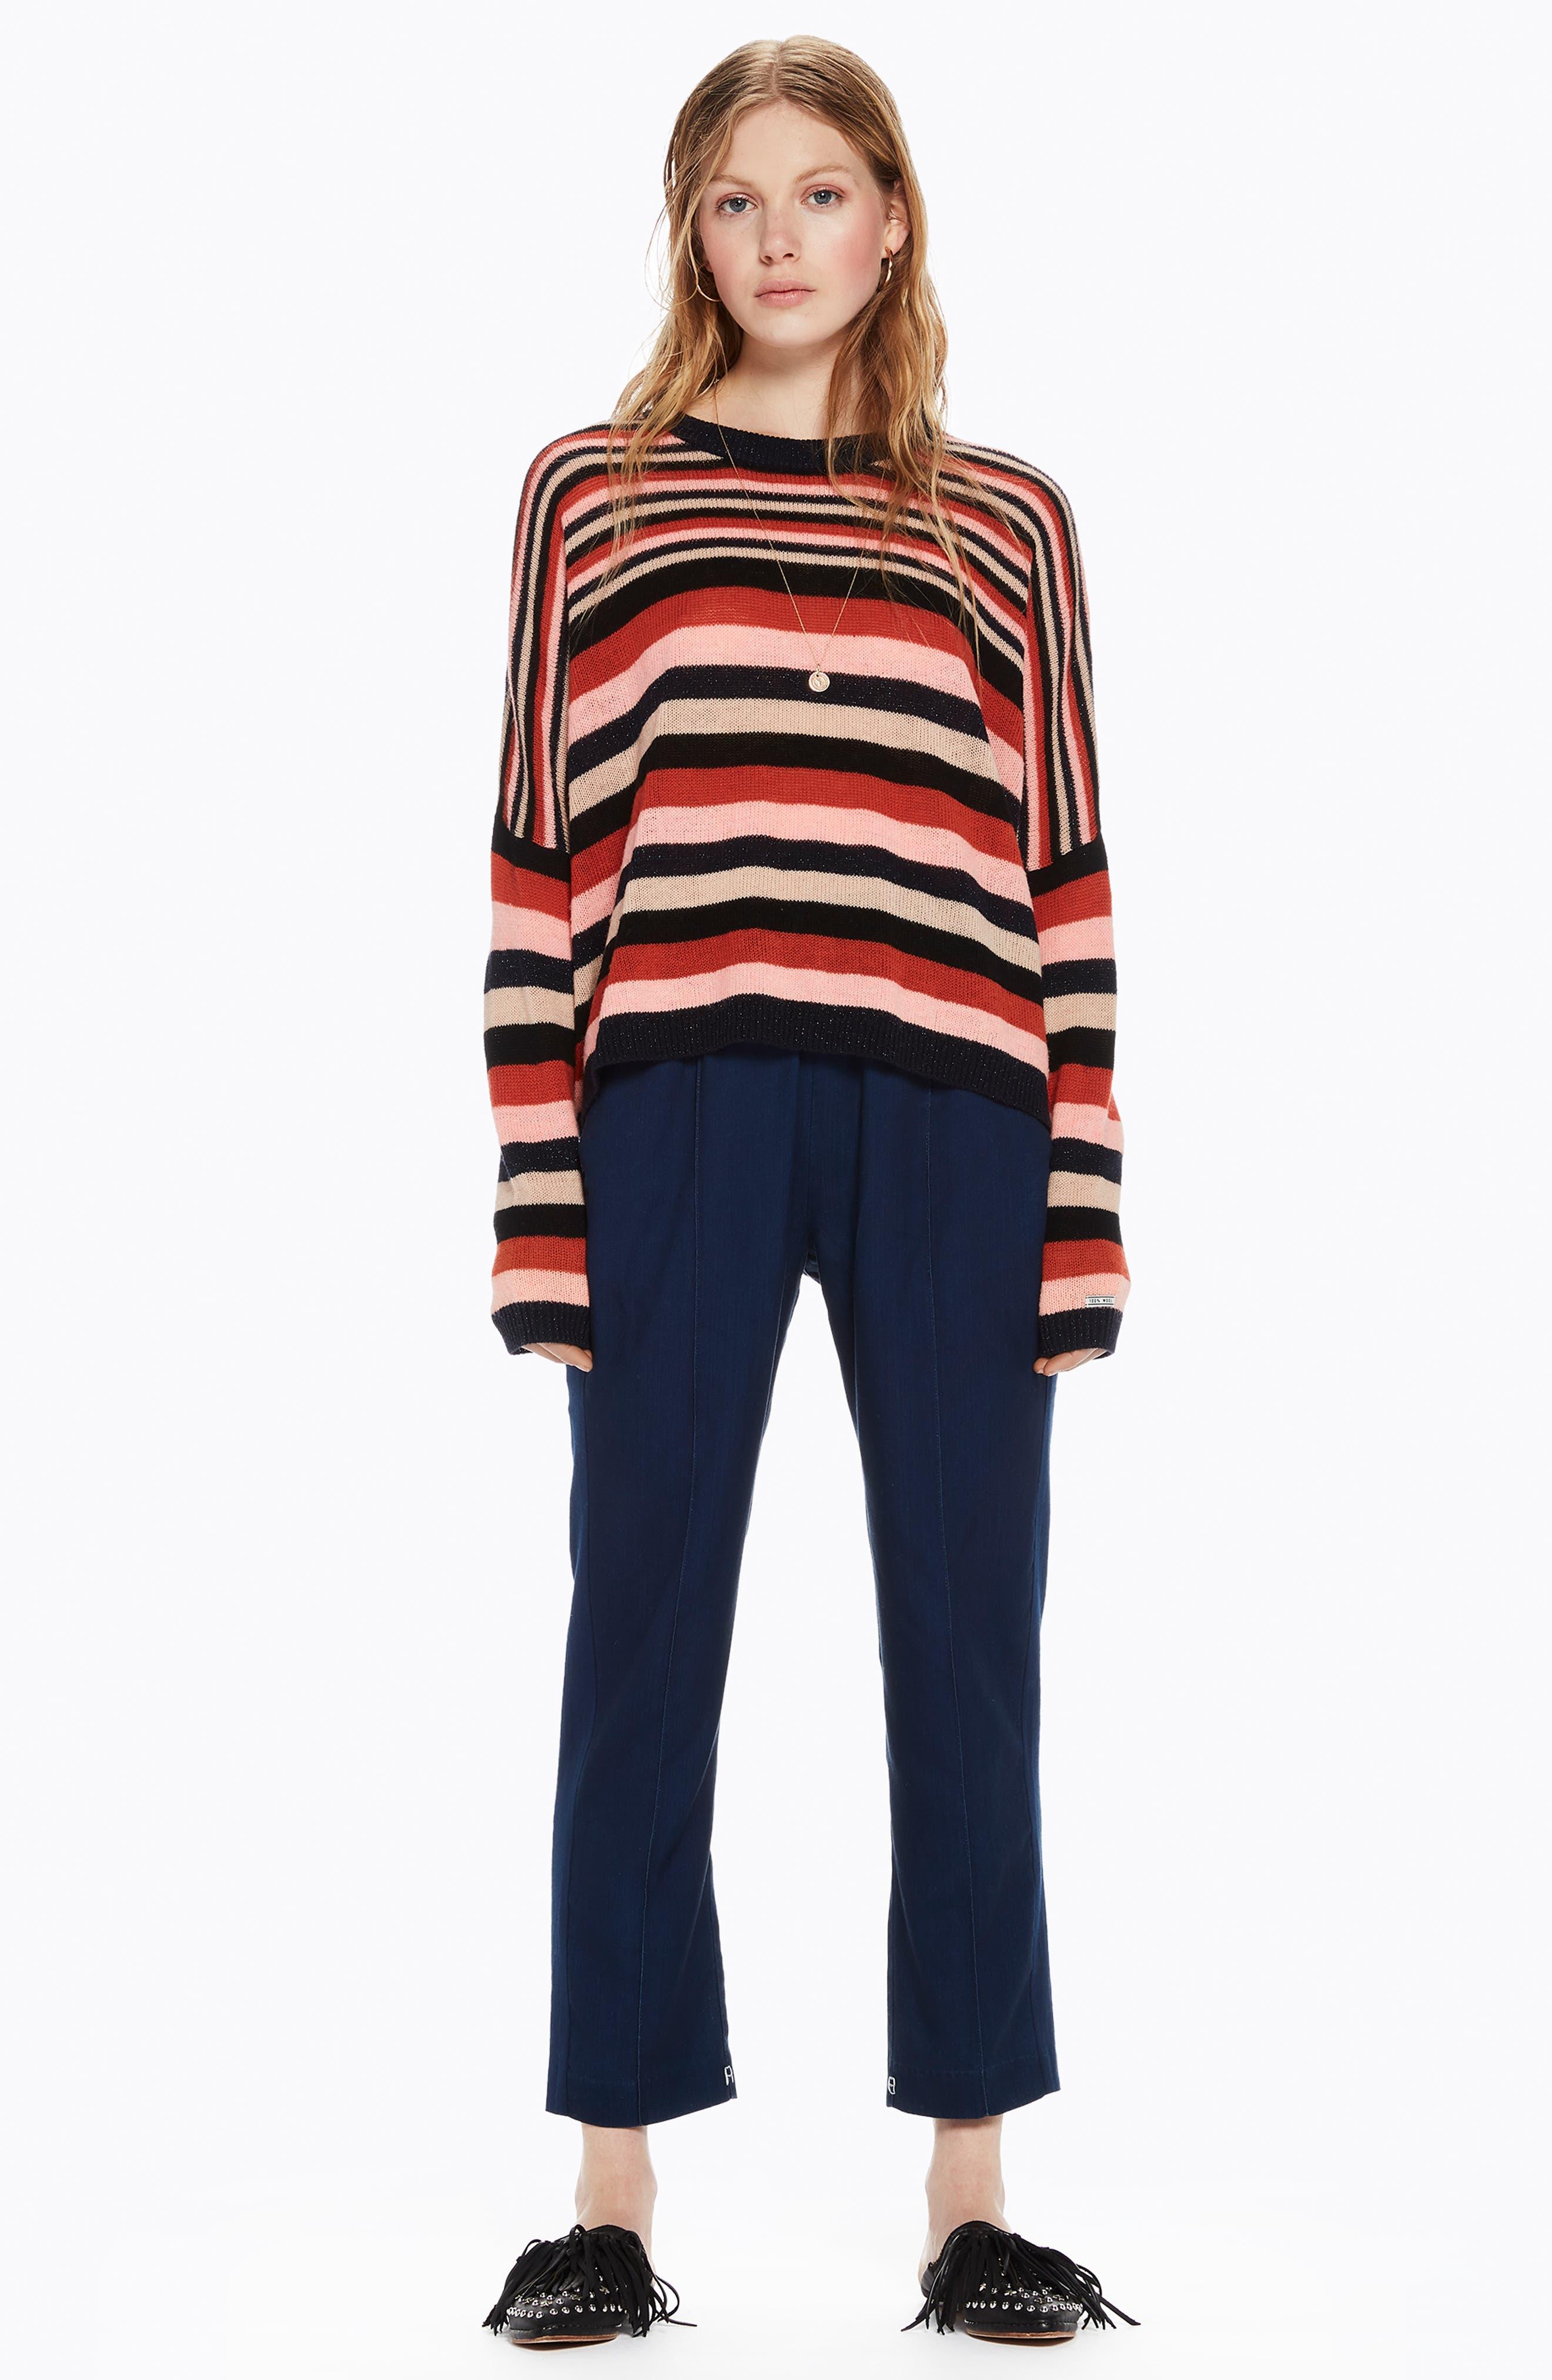 SCOTCH & SODA,                             Stripe Sweater,                             Alternate thumbnail 10, color,                             651